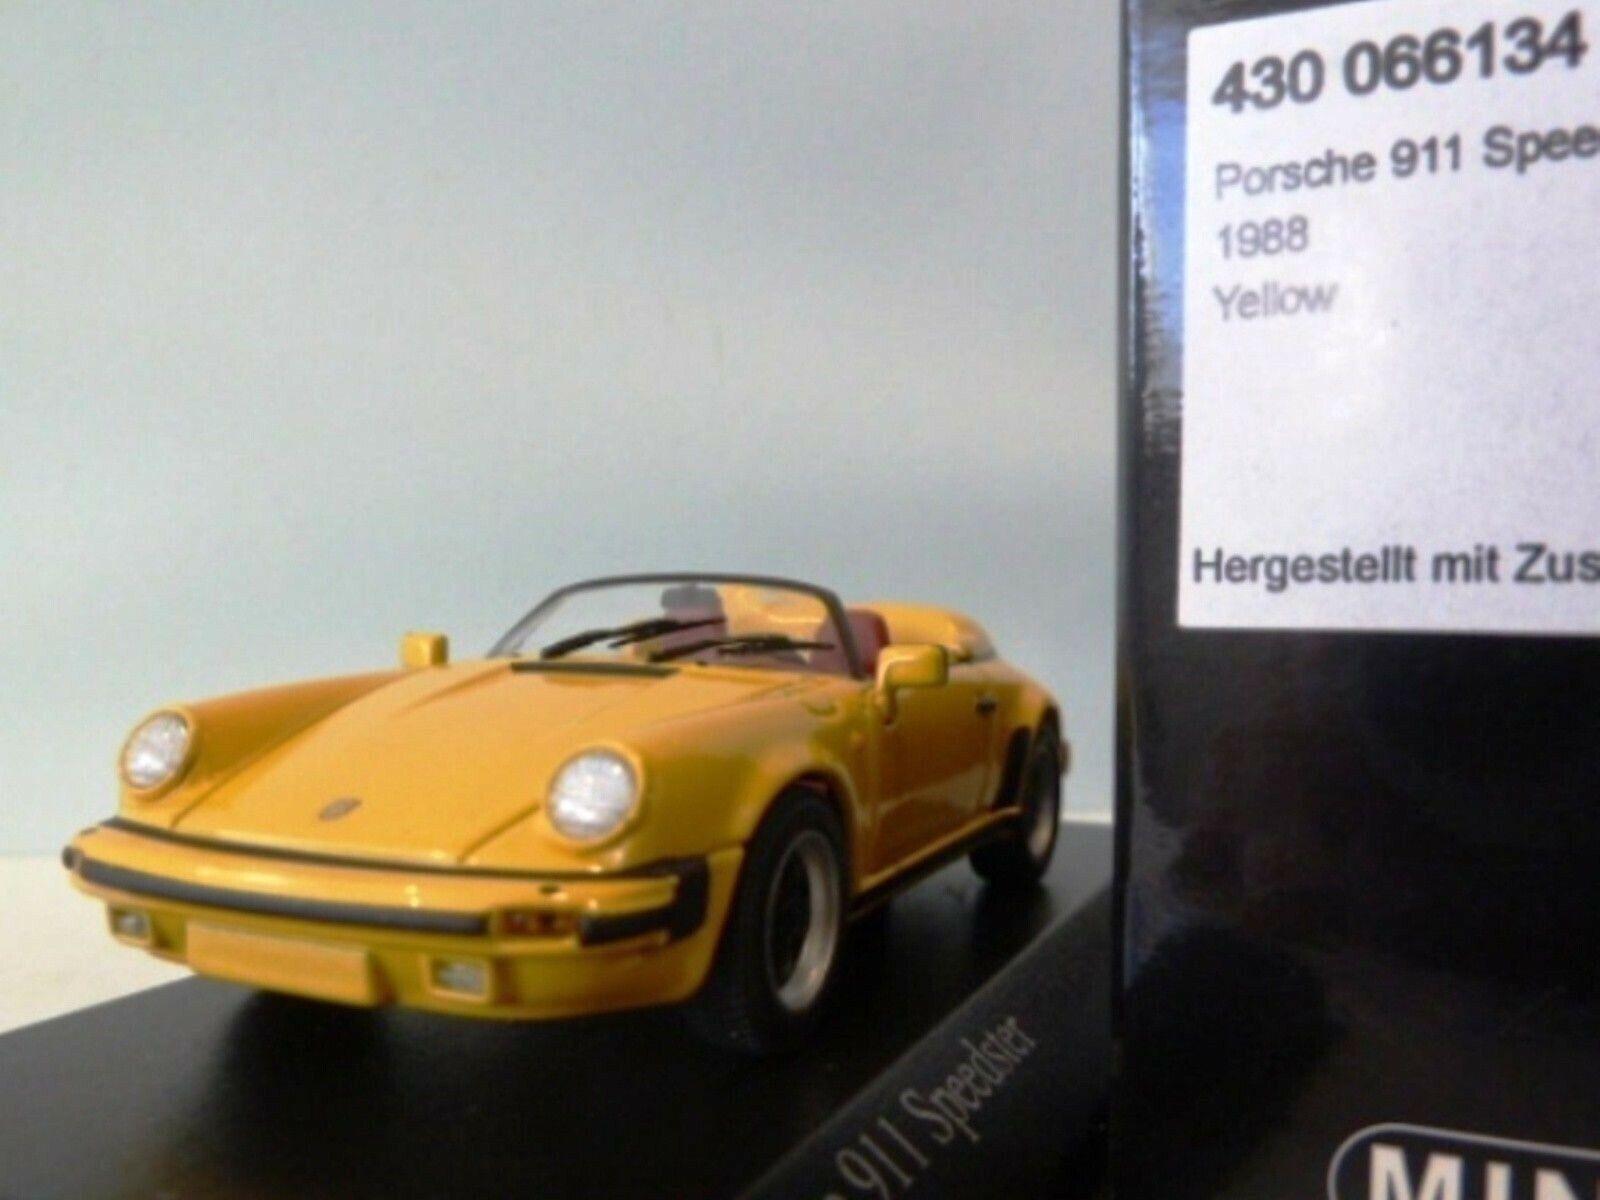 Wow extrêmeHommest  rare Porsche 930 1988 911 G-Modèle SPEEDSTER jaune 1 43 Minichamps  bas prix